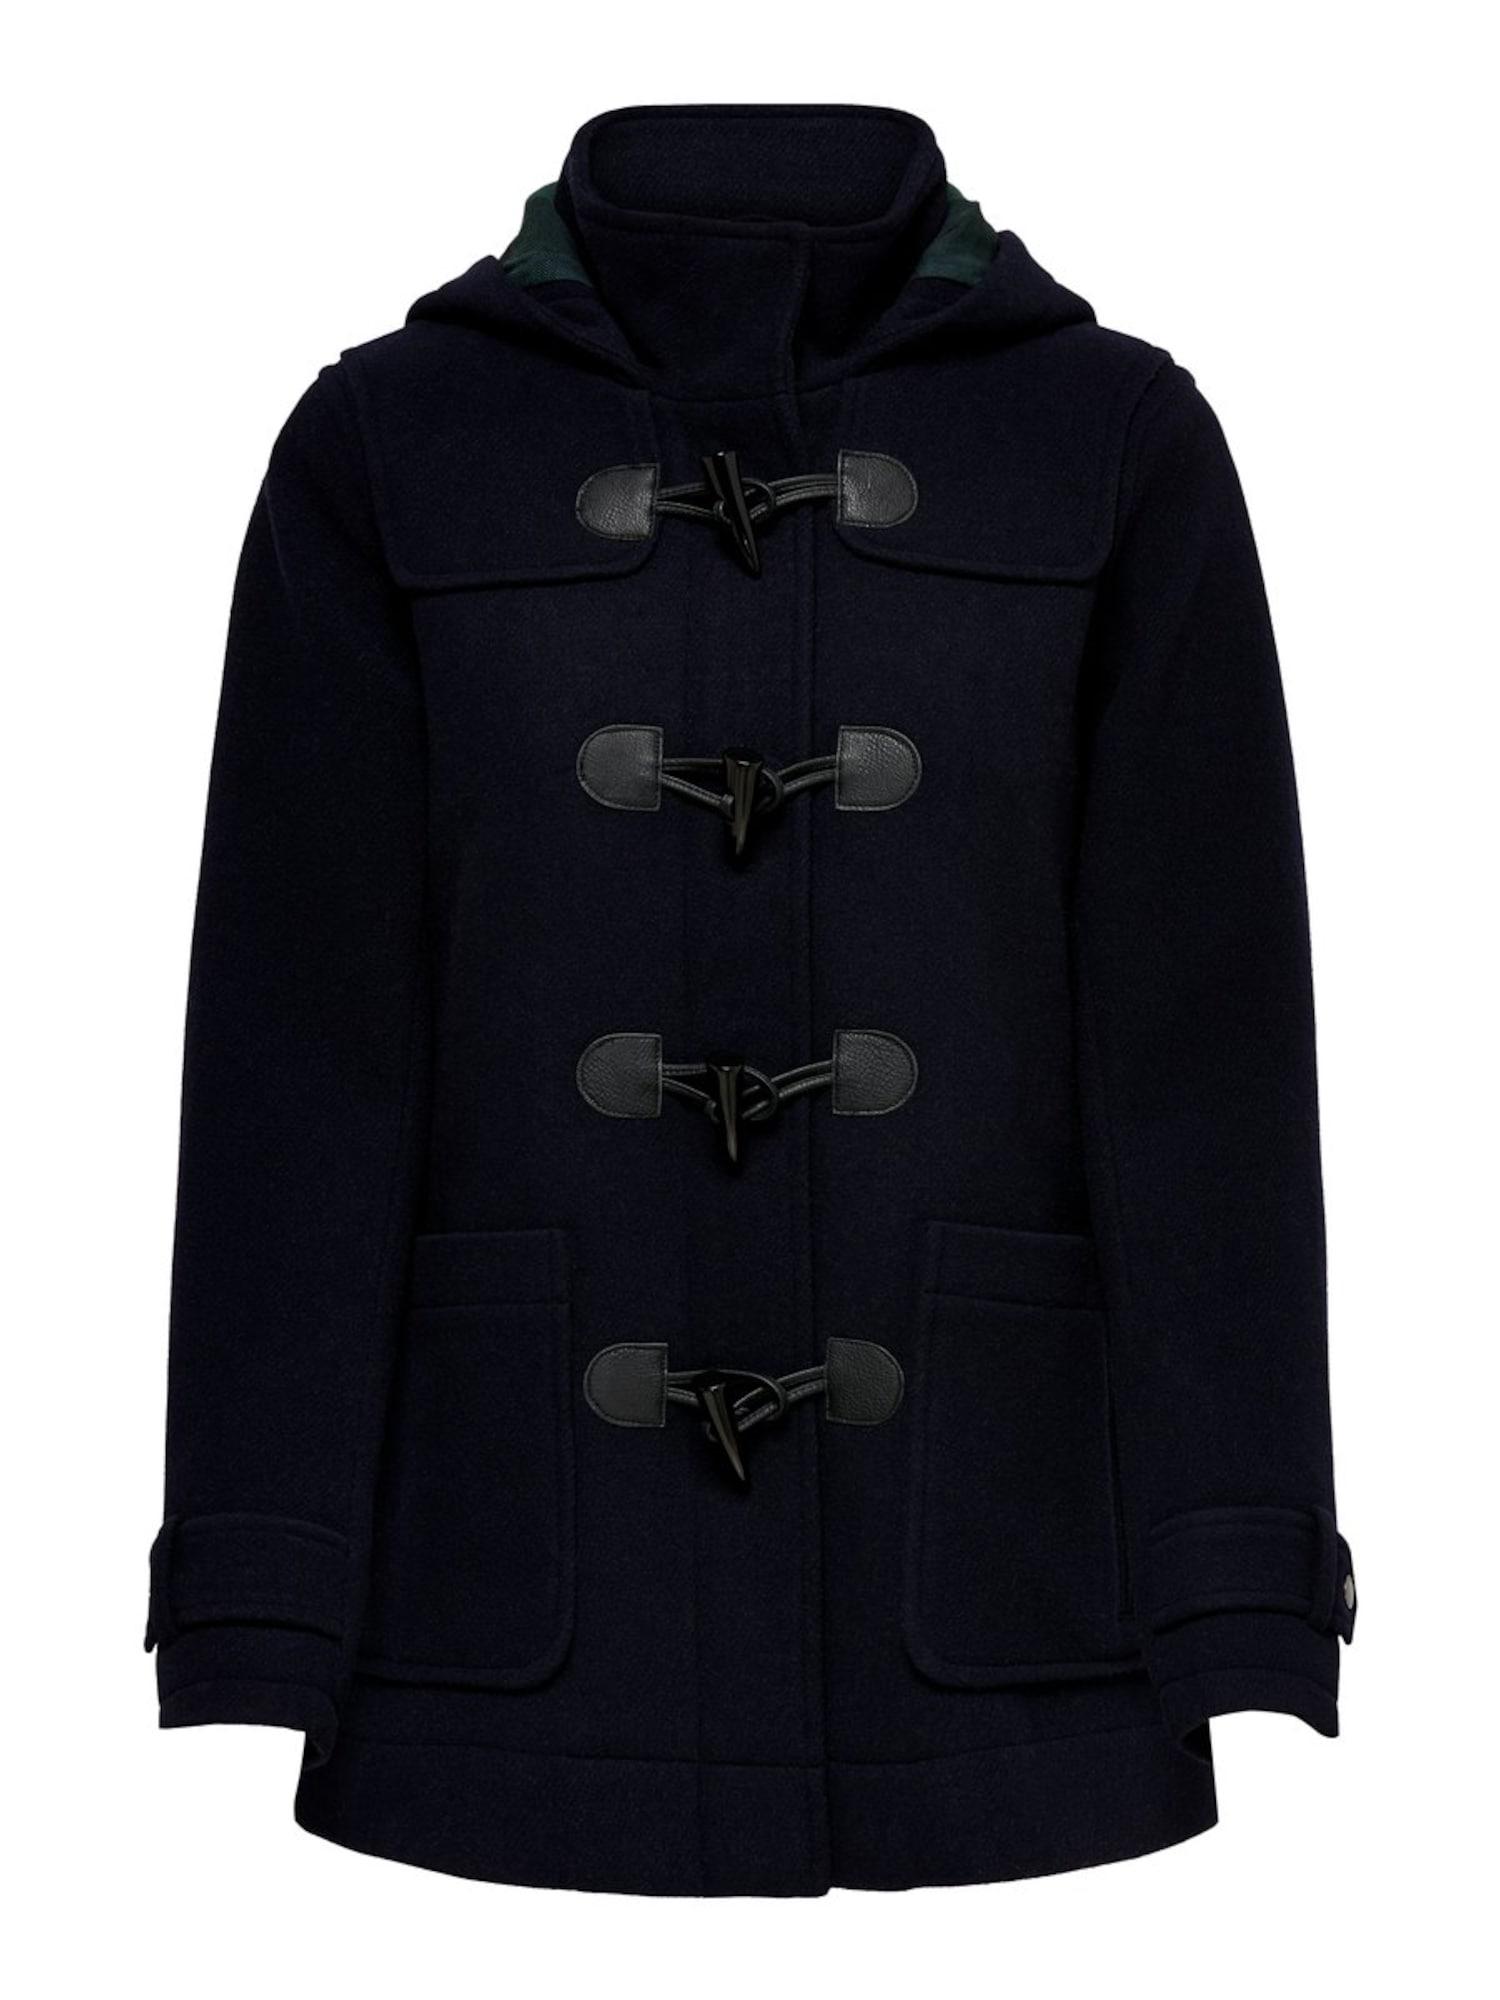 ONLY Rudeninis-žieminis paltas 'CASSIE RIANNA' nakties mėlyna